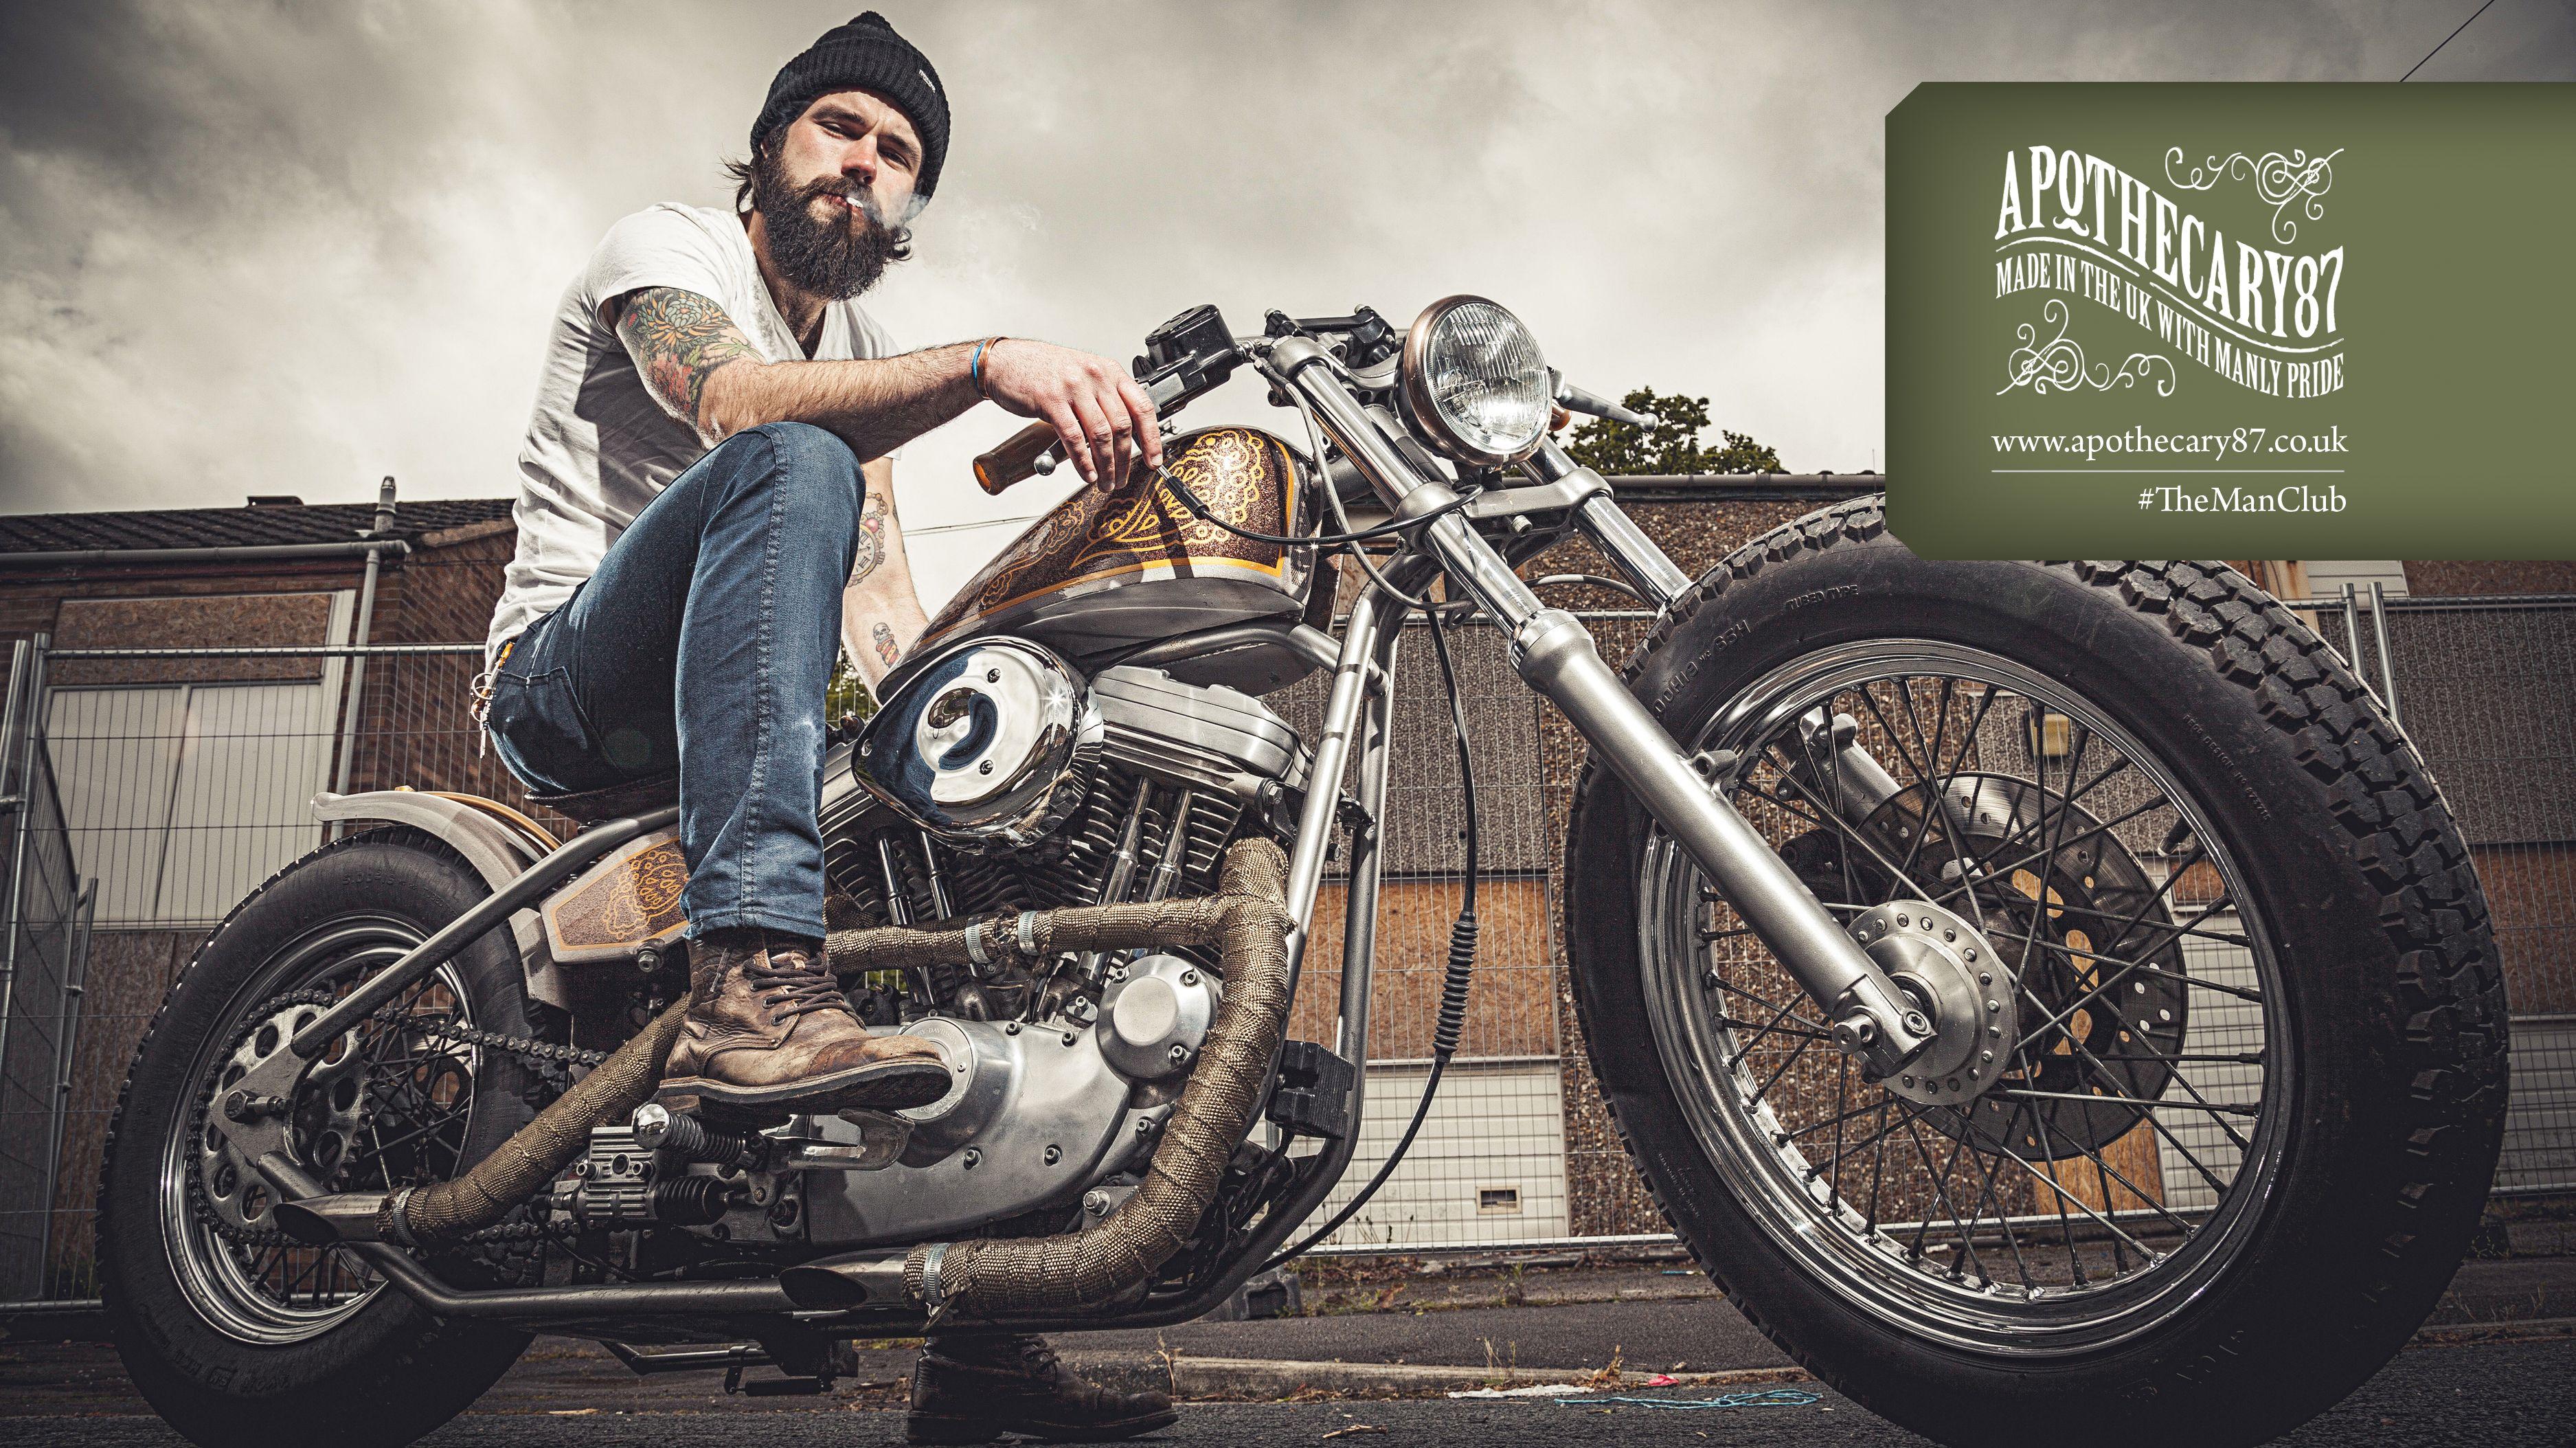 Apothecary87 Screen Saver Themanclub Beard Beard Oil Motorbike Harley Davidson Tattoos Men With Beards Man With Beard Facial Hair Moustach Erkek Modasi